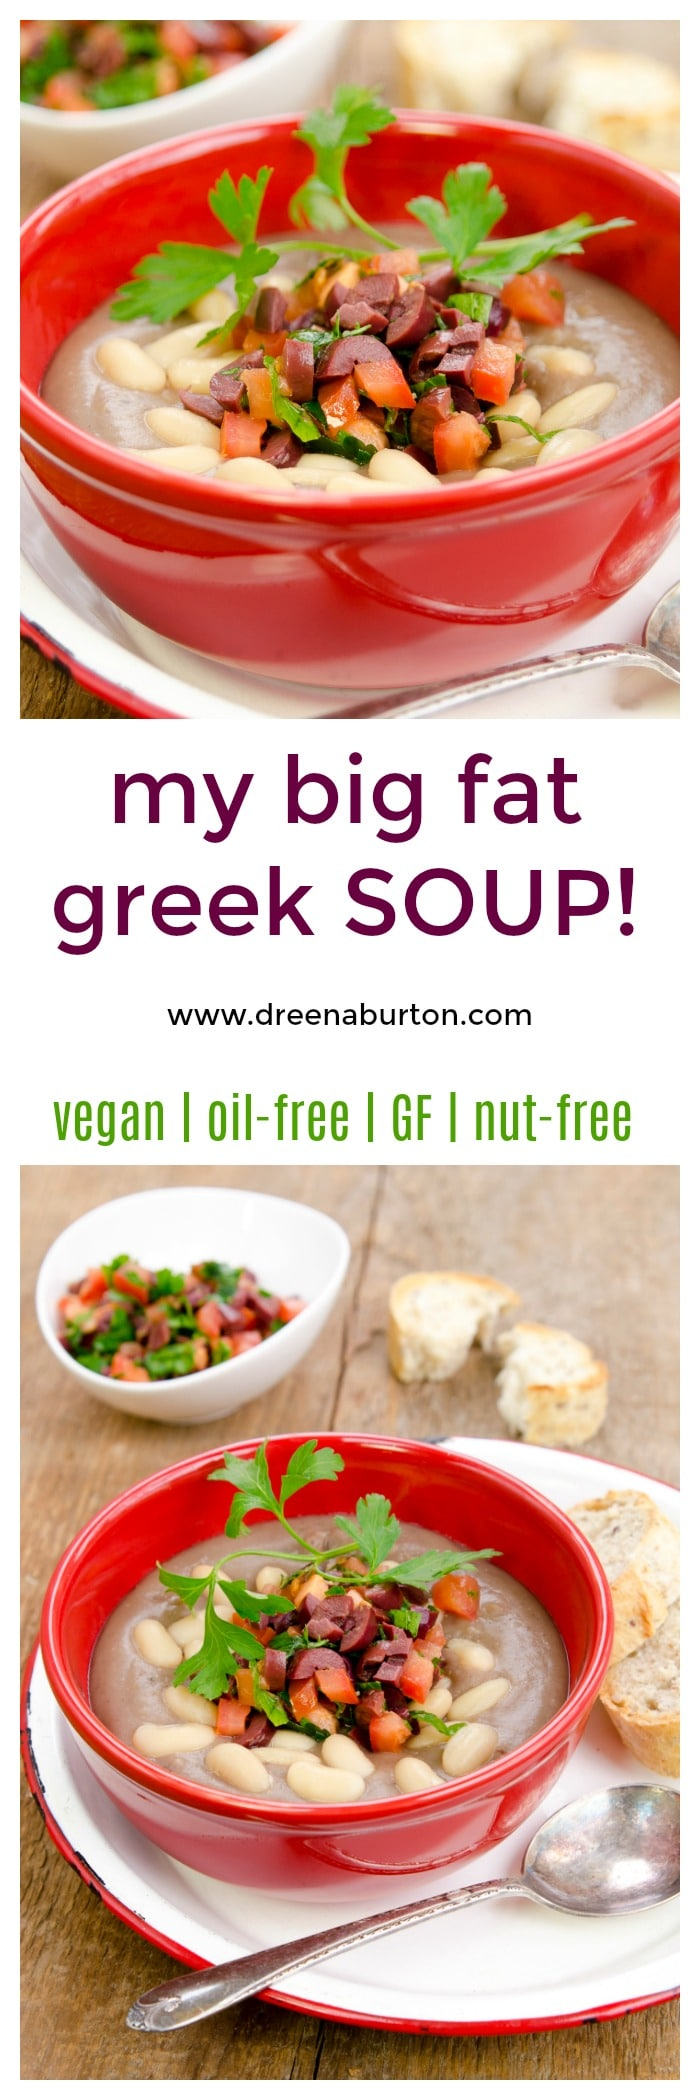 my big fat greek - soup! Greek Lentil Soup - BIG flavor, and nutrition, low fat. | vegan soup recipes | oil-free soup recipes | gluten-free soup recipes | nut-free soup recipes | healthy soup recipes || Plant Powered Kitchen